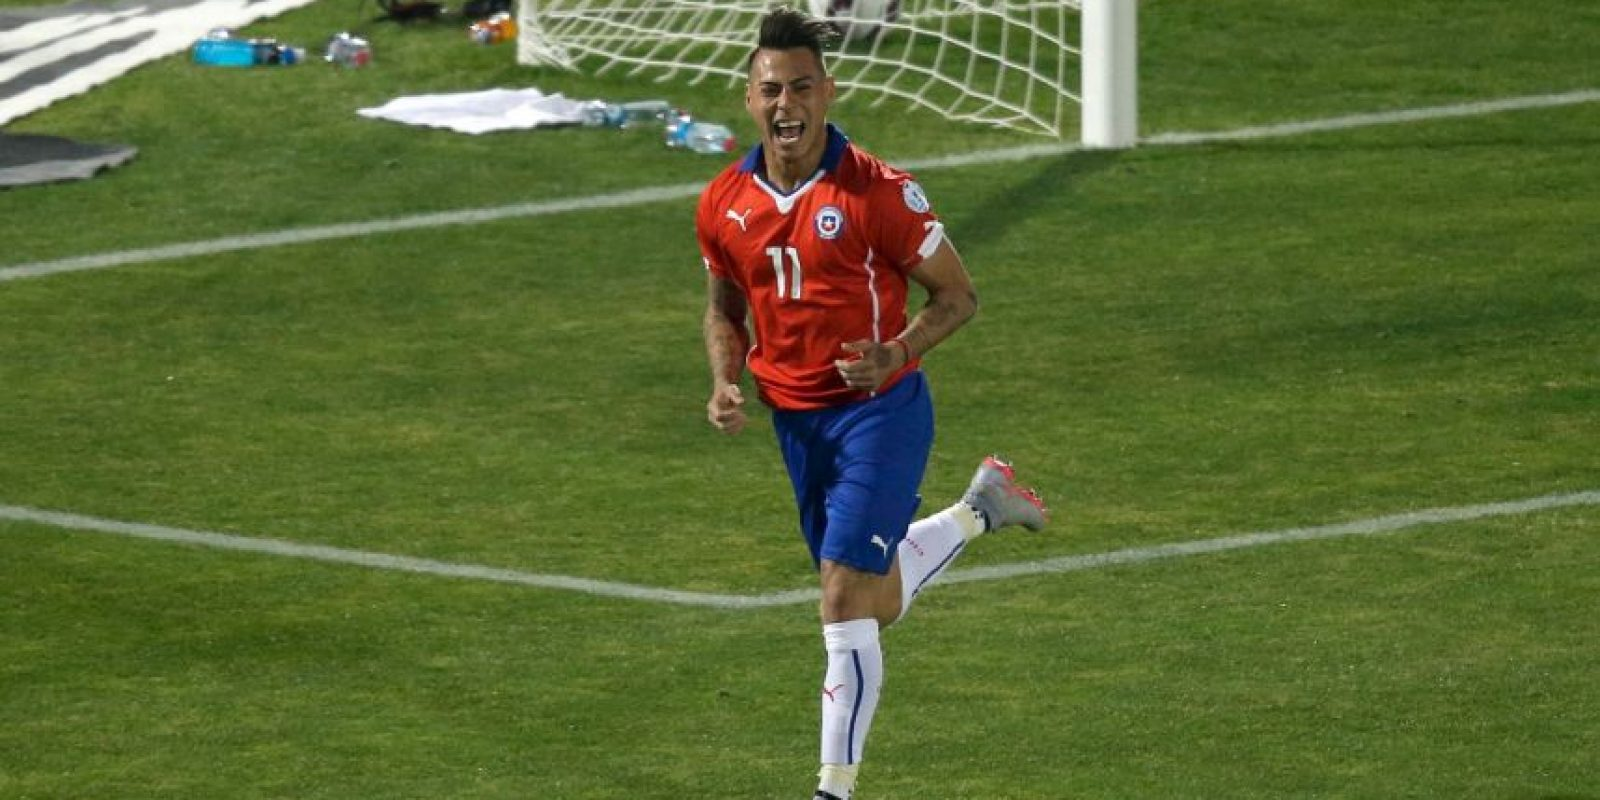 Con sus goles, llevó a Chile a la final del torneo Foto:AFP